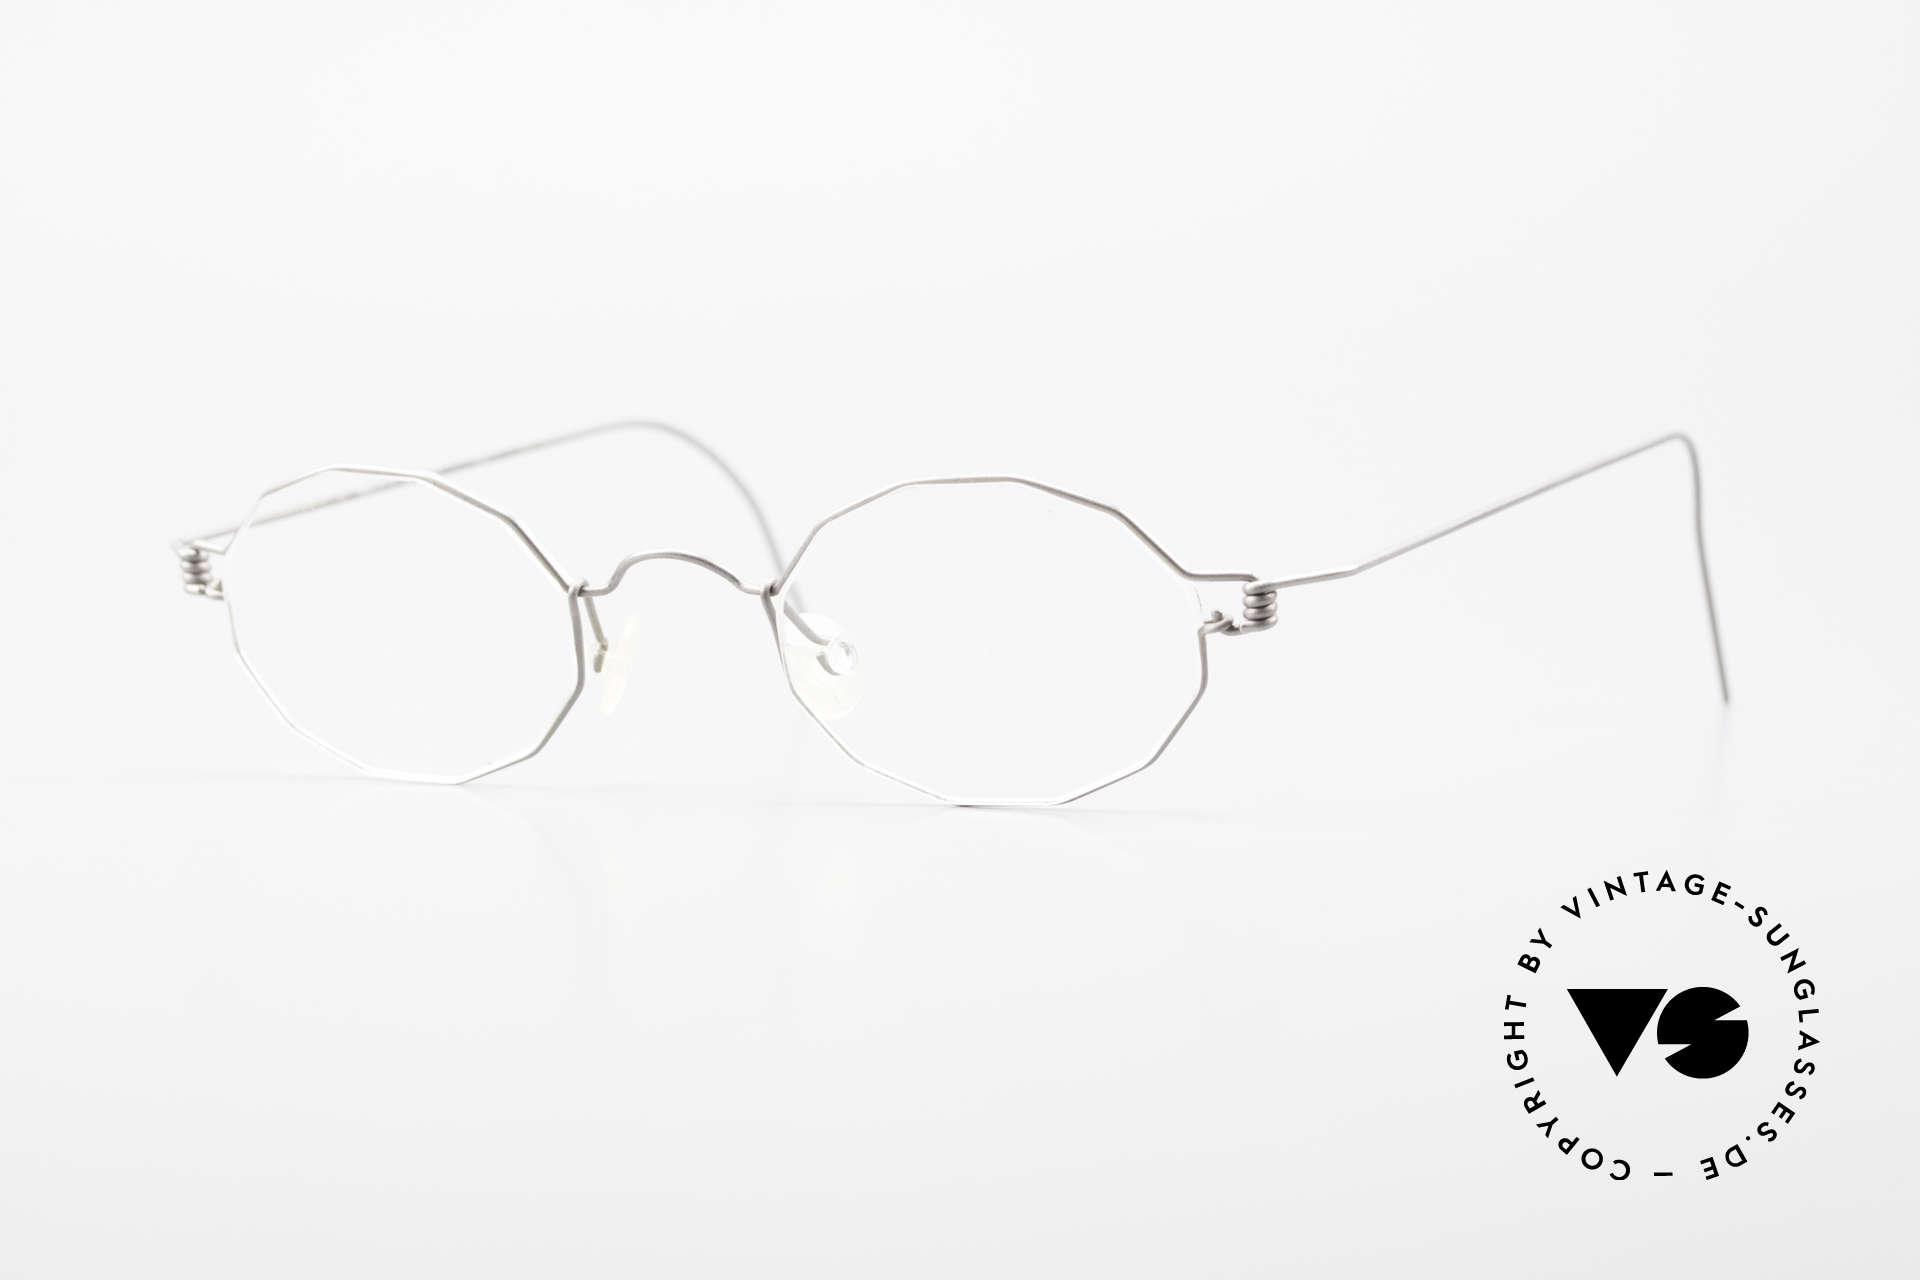 Lindberg Zeta Air Titan Rim Titanium Frame Small Unisex, LINDBERG Air Titanium Rim glasses, small size 40-21, Made for Men and Women